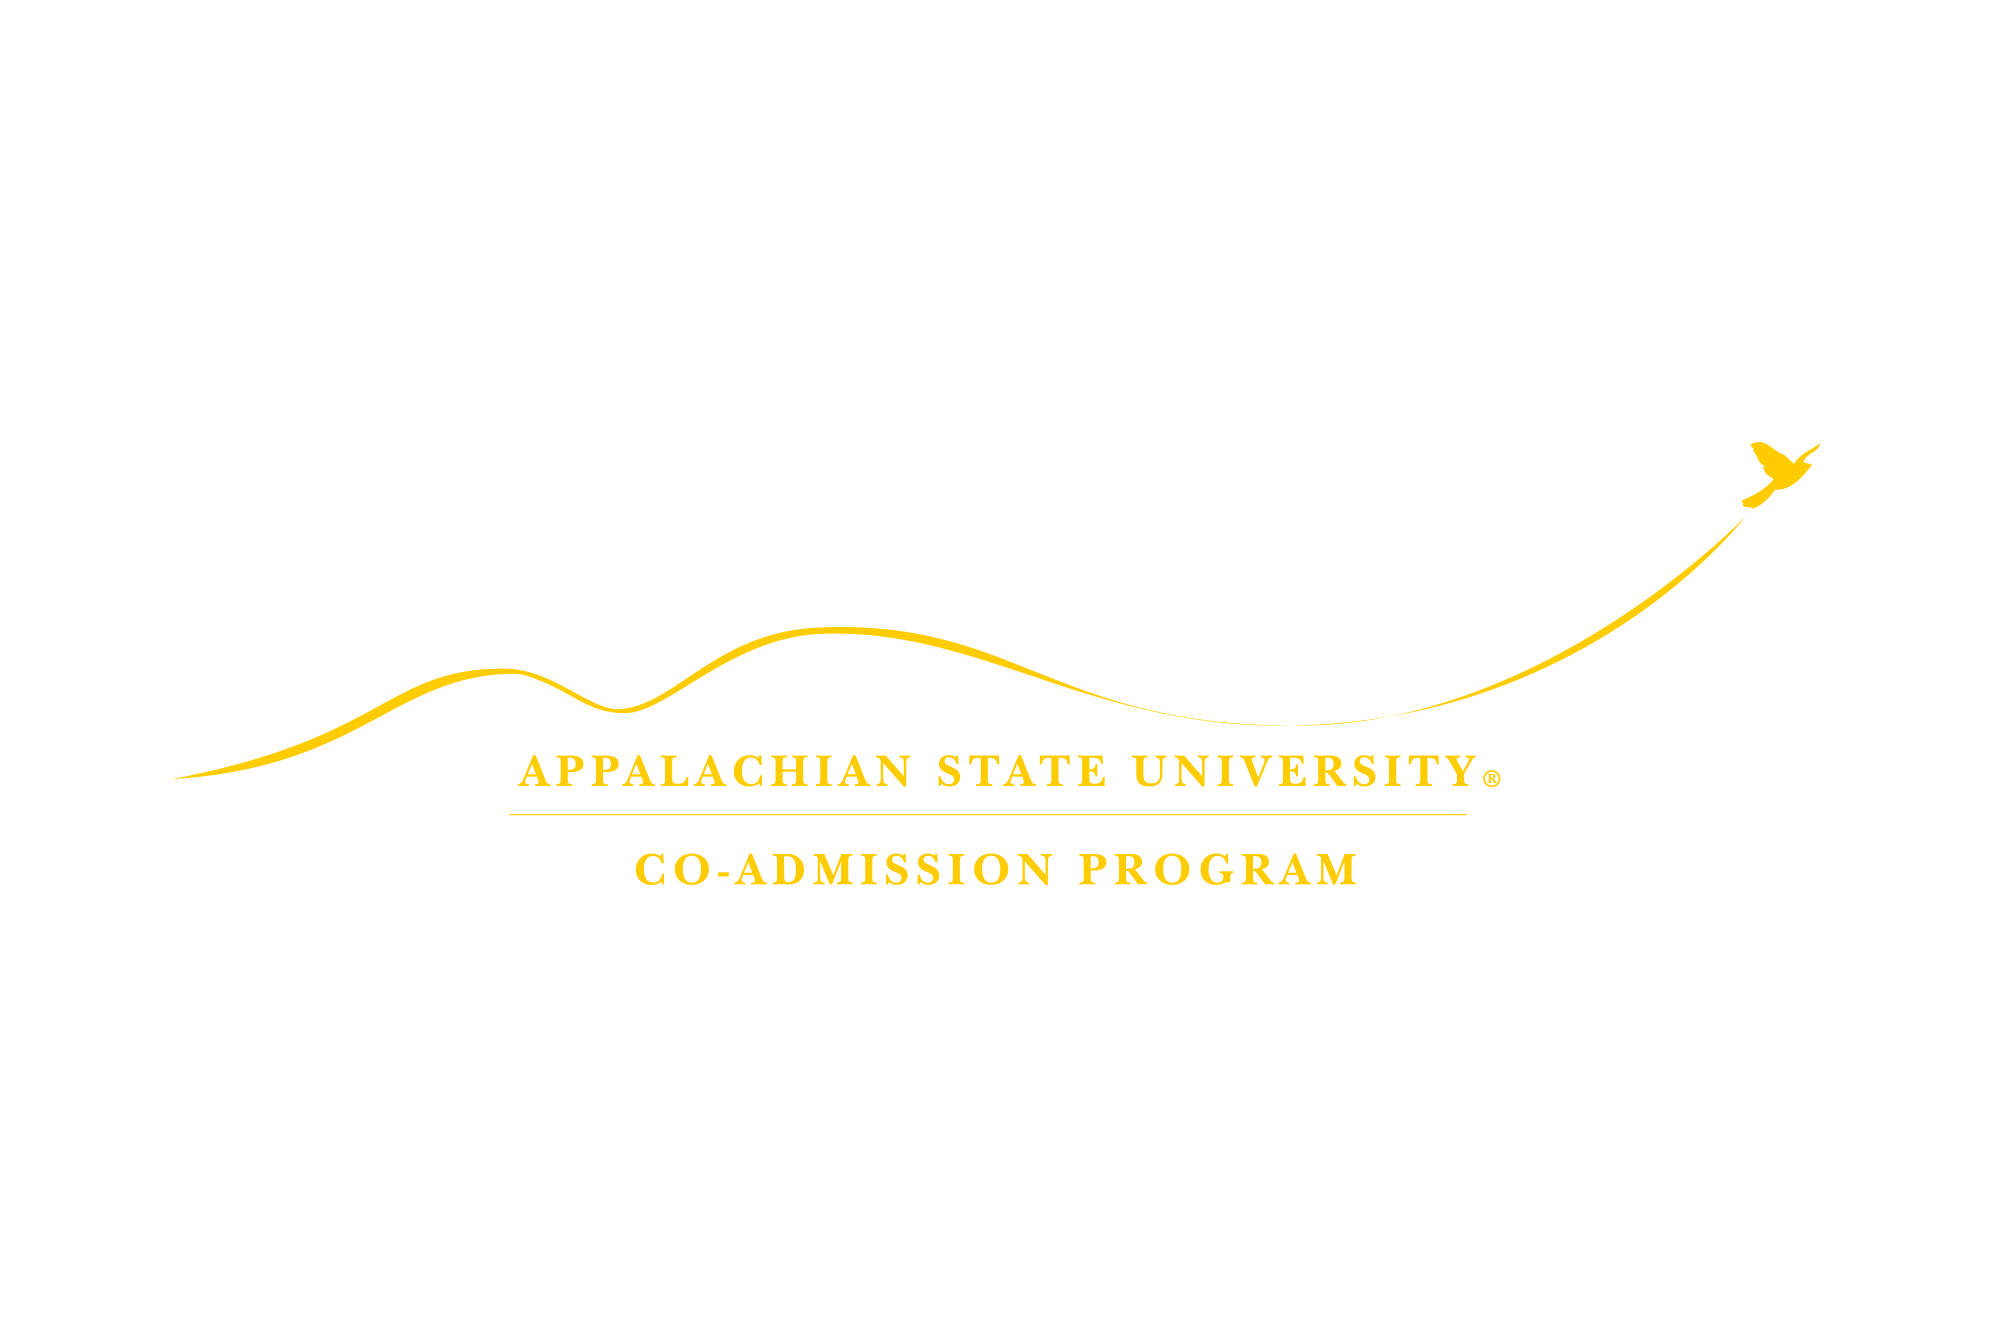 Aspire Appalachian